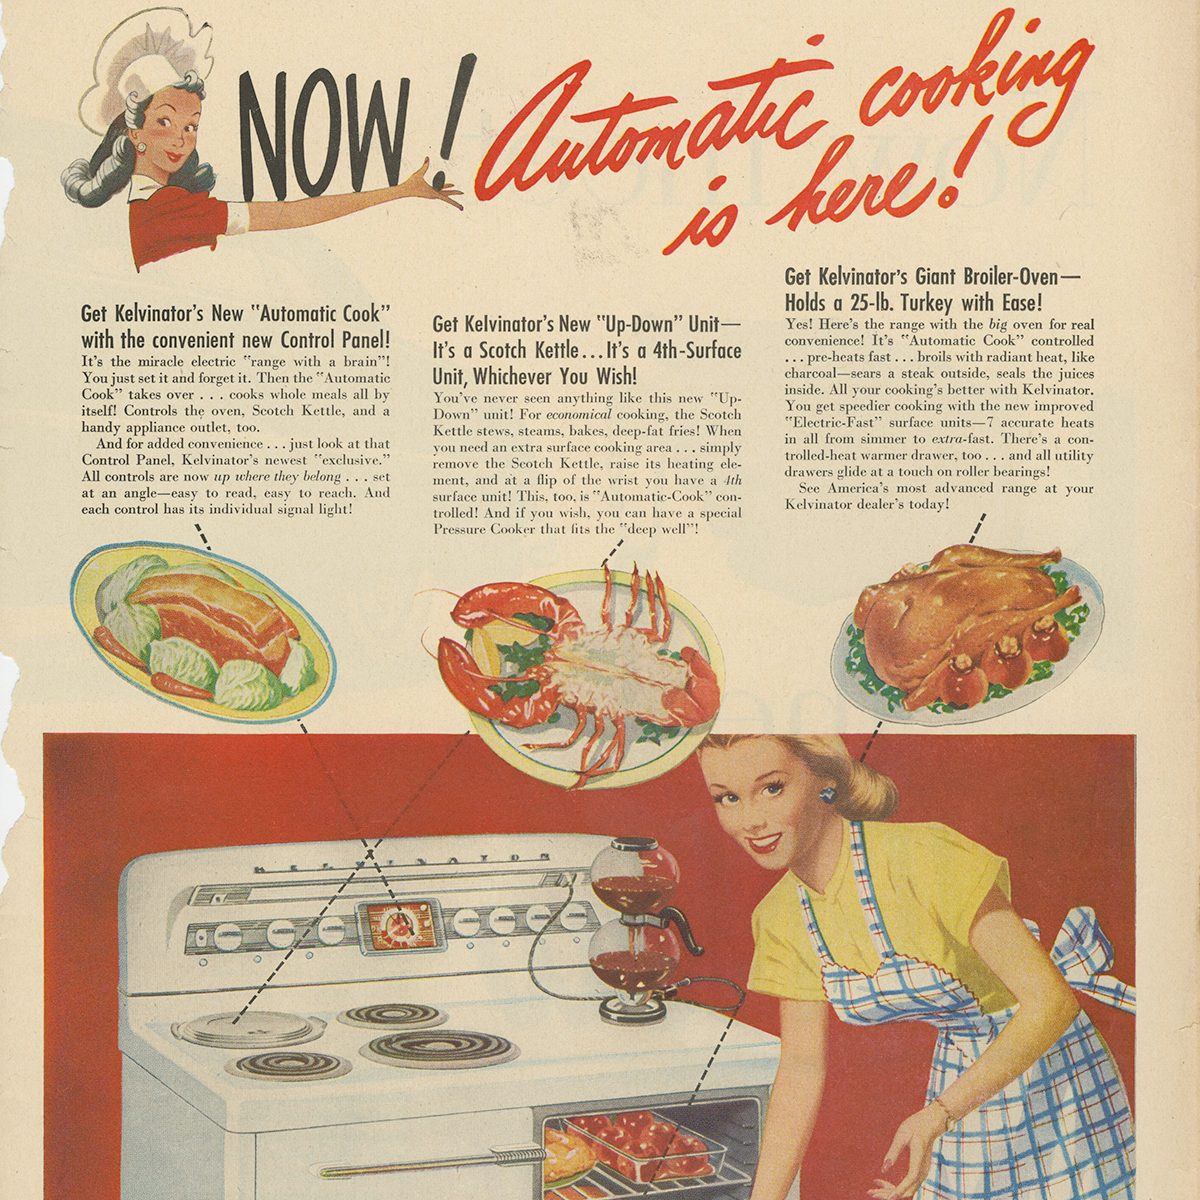 Kelvinator Automatic Cook